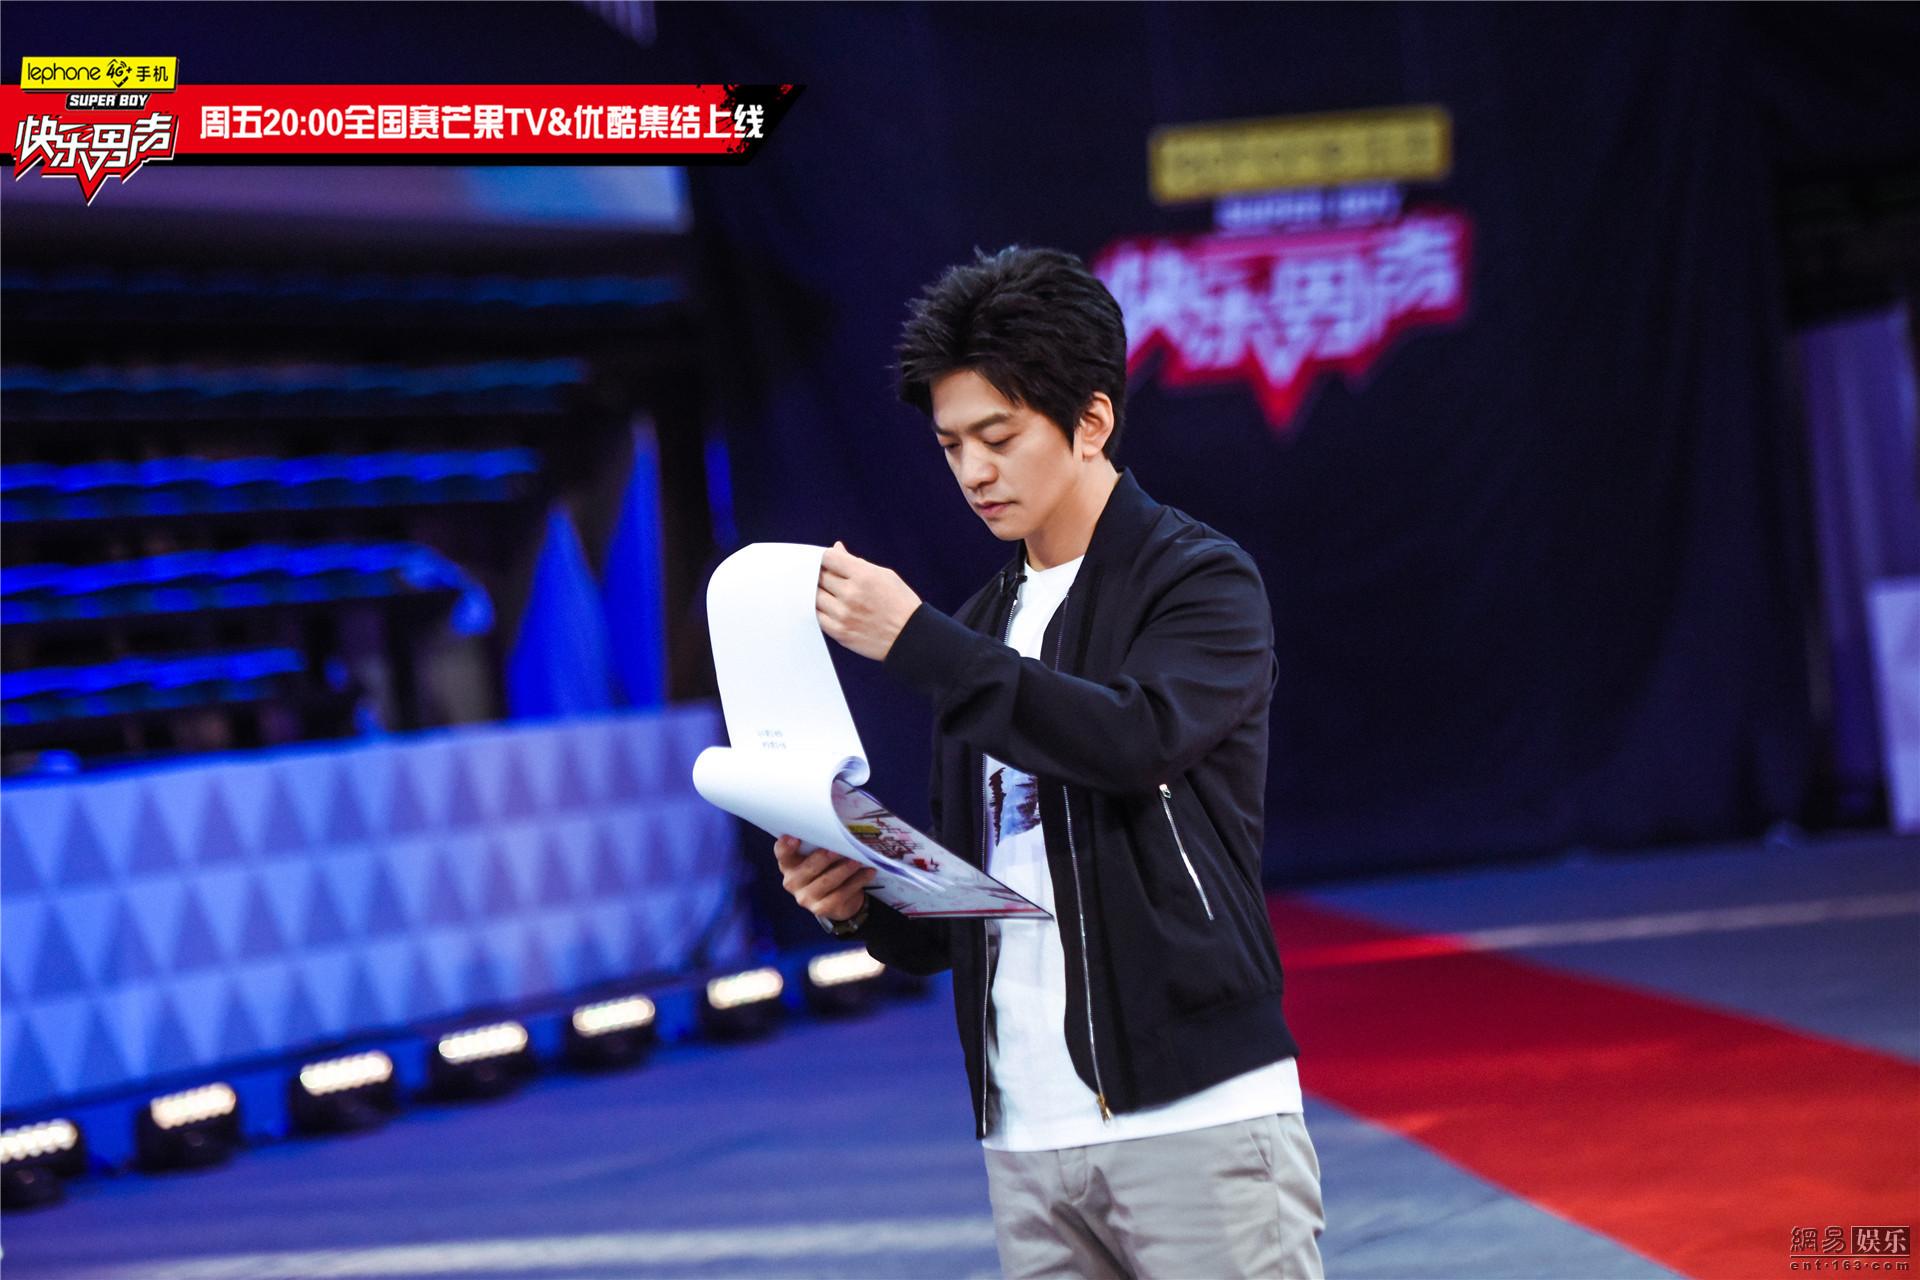 <a href='http://search.xinmin.cn/?q=快男' target='_blank' class='keywordsSearch'>快男</a>总决赛首场